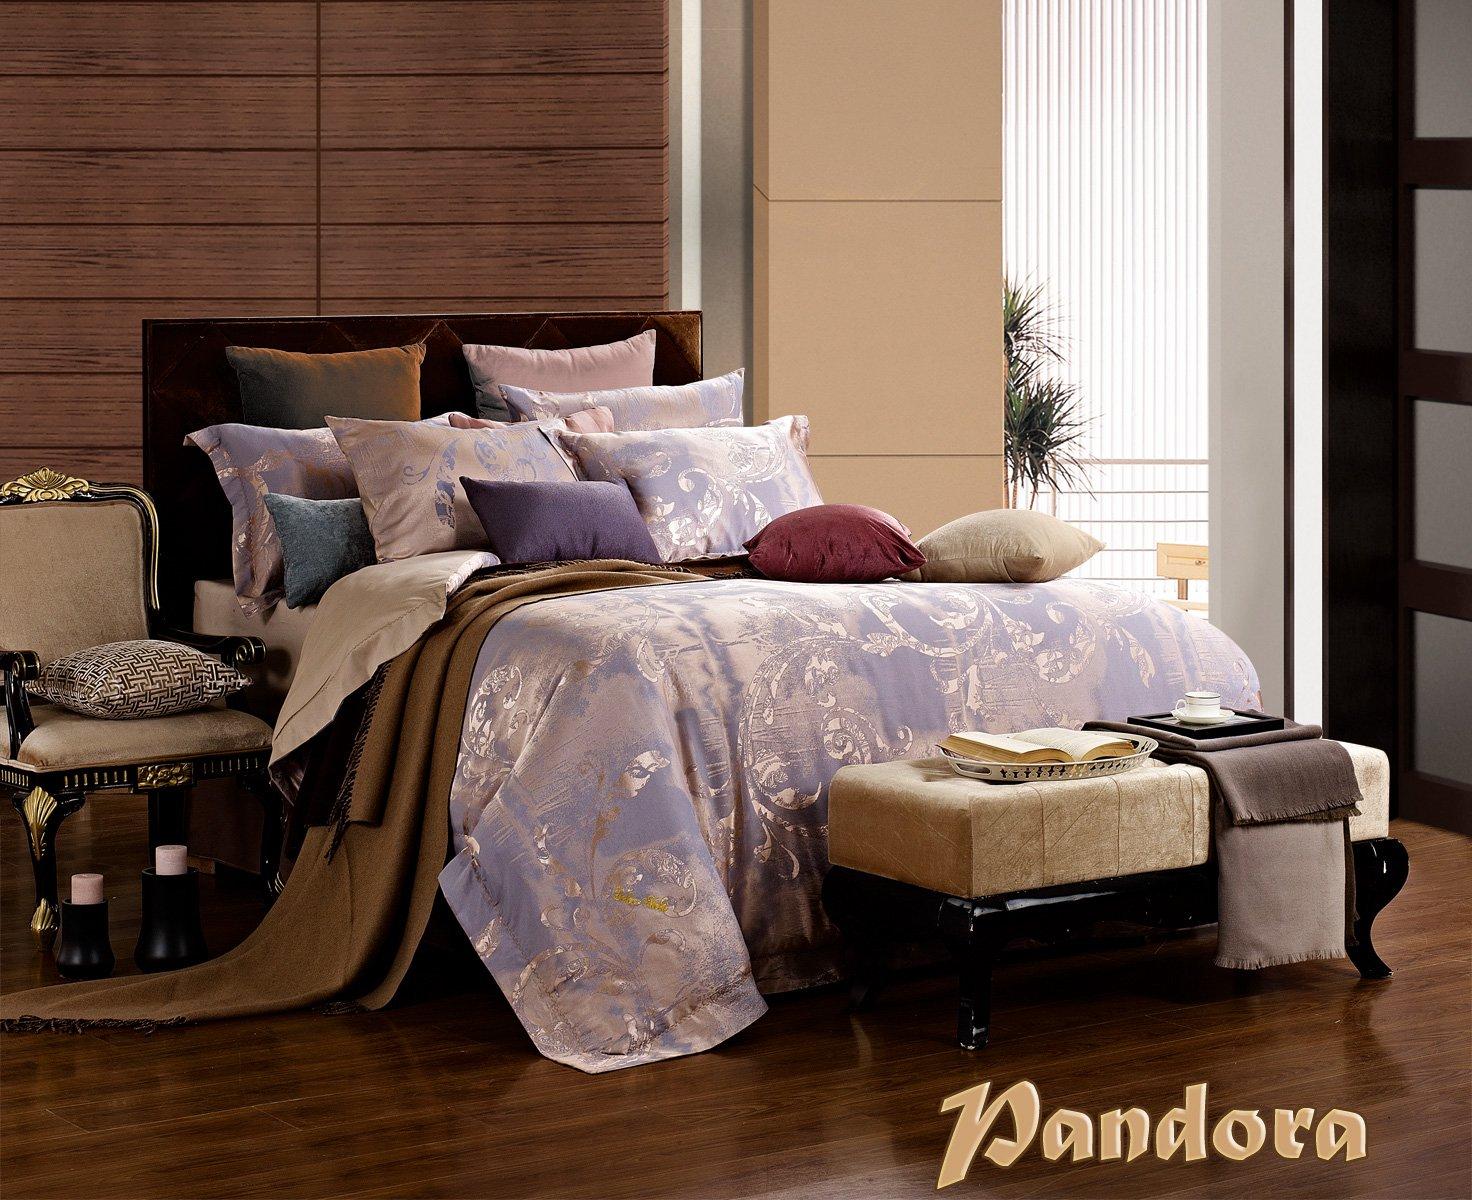 Pandora By Dolce Mela 6 Pc King Size Duvet Cover Set